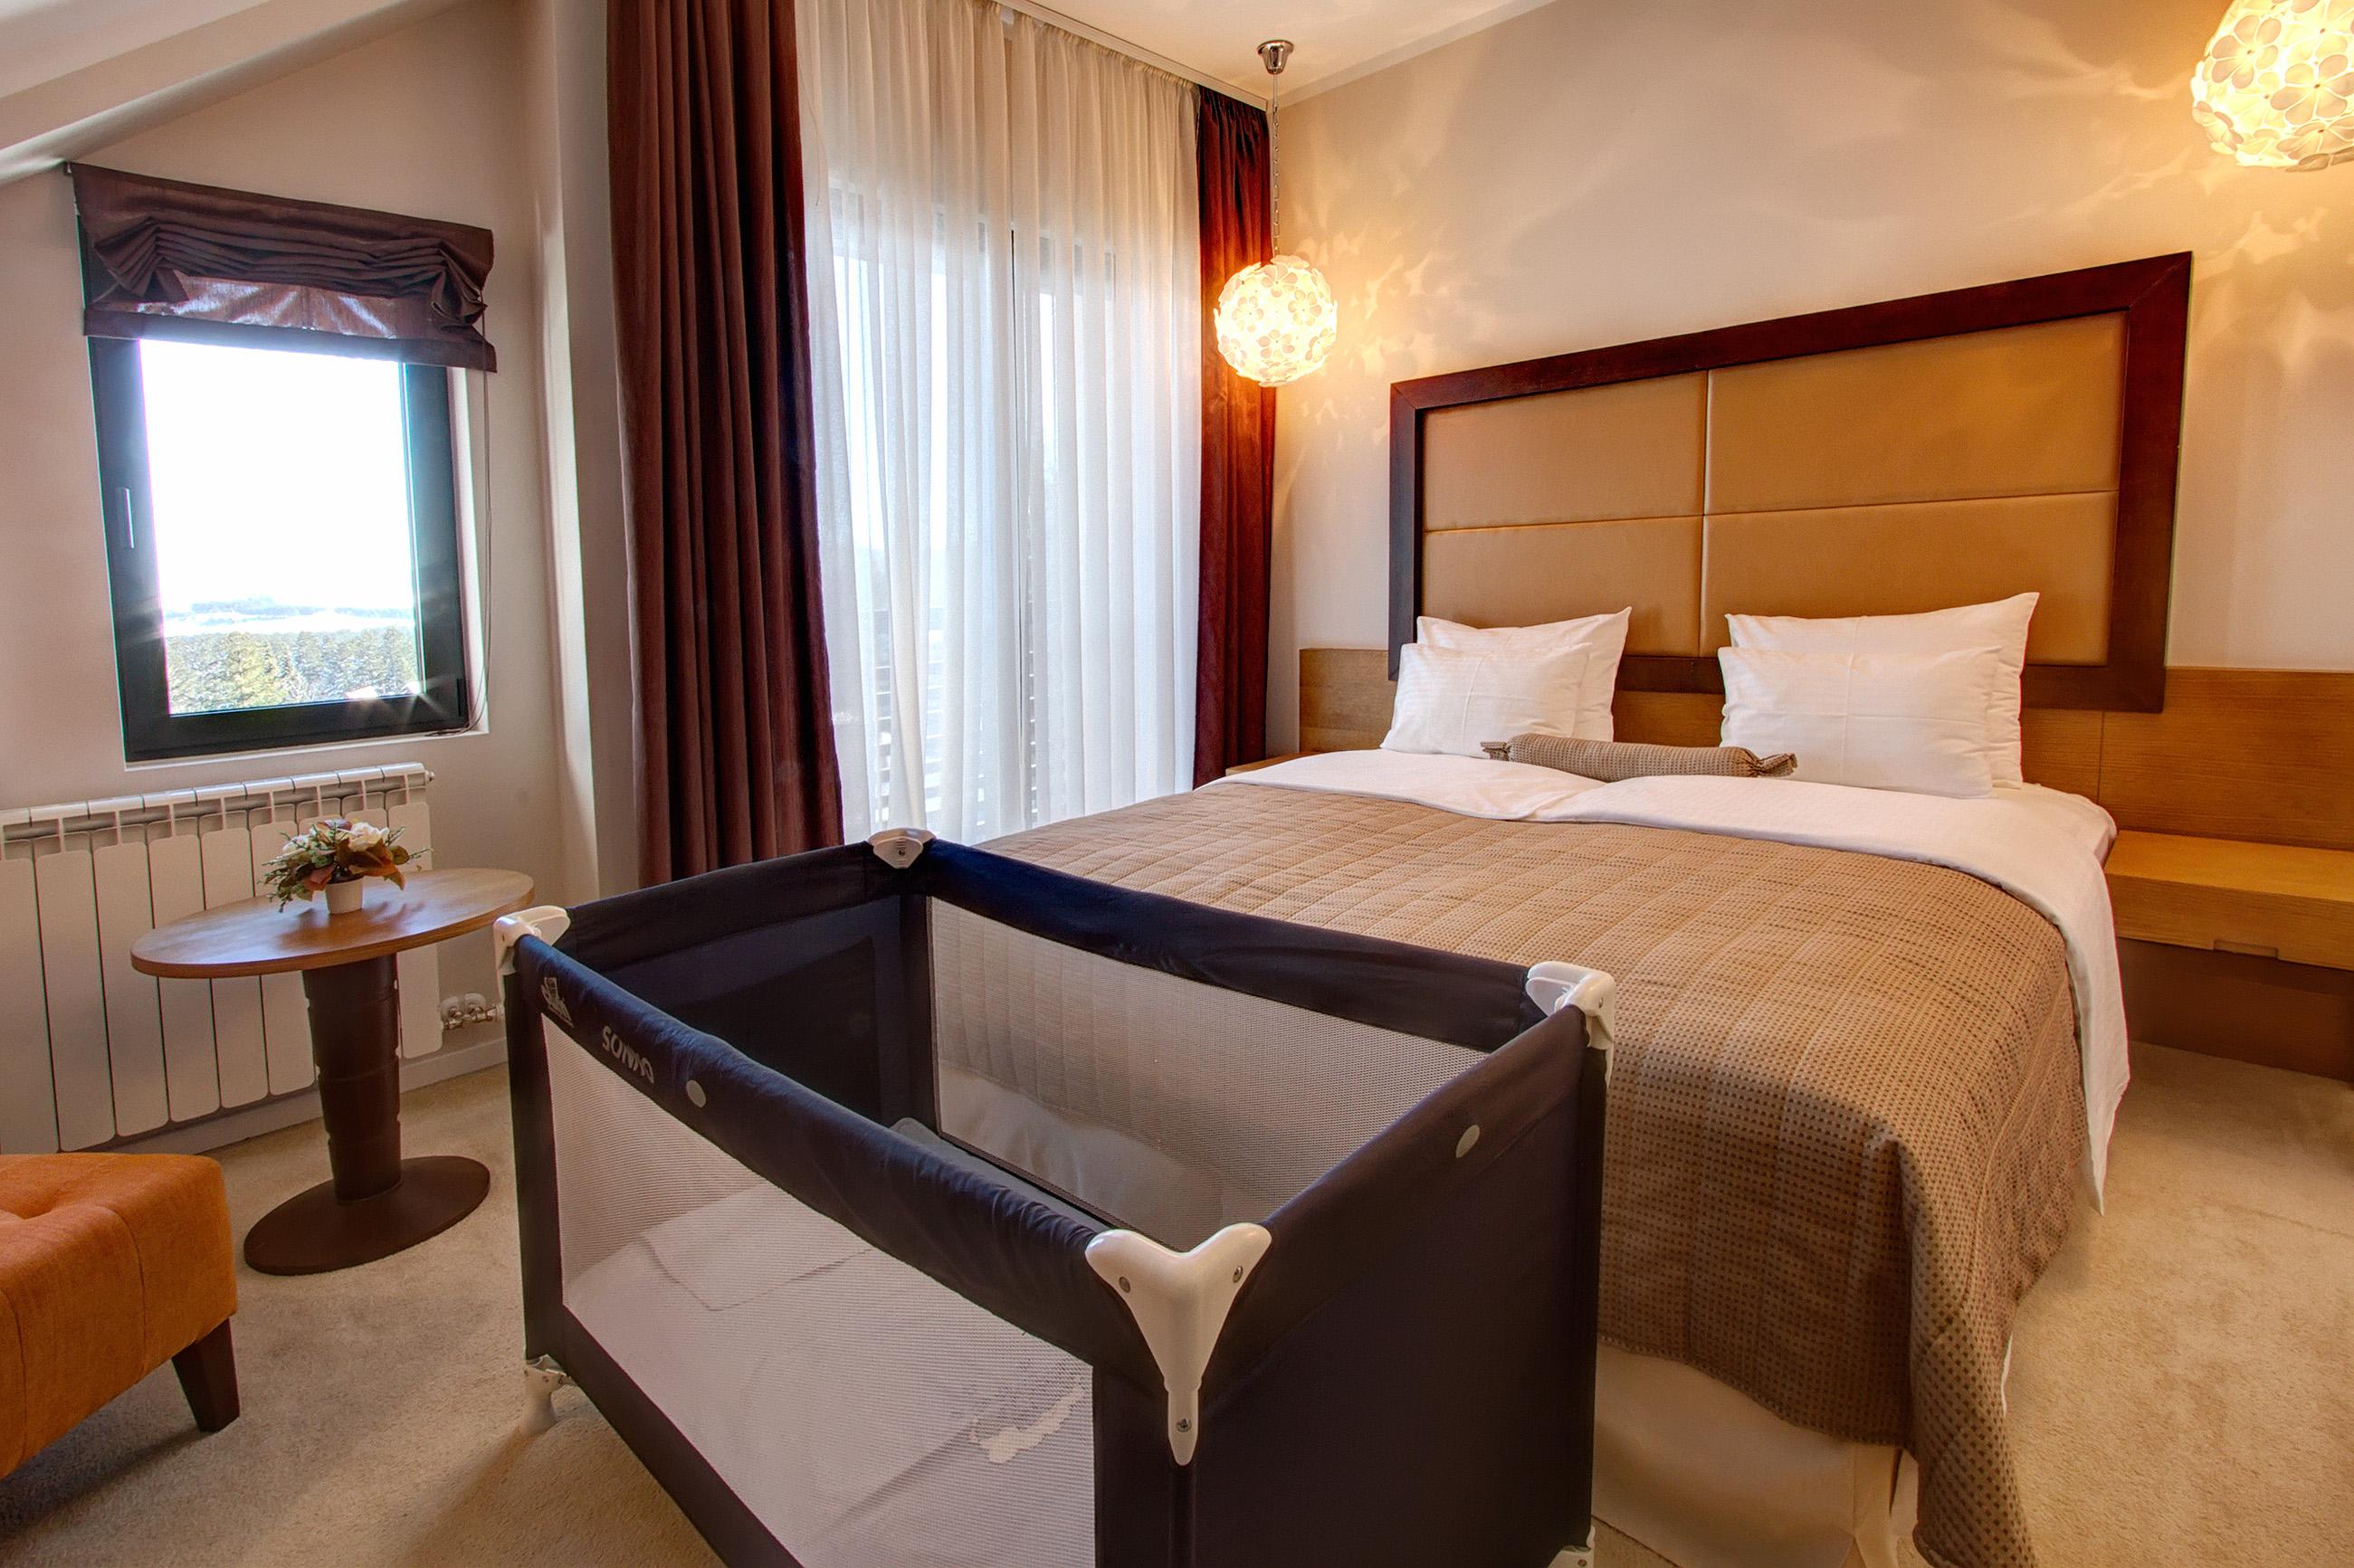 Zlatibor, smestaj, letnji odmor, spavanje, pansion, spa, soba, apartman, akcija, nova godina, hotel mir 17